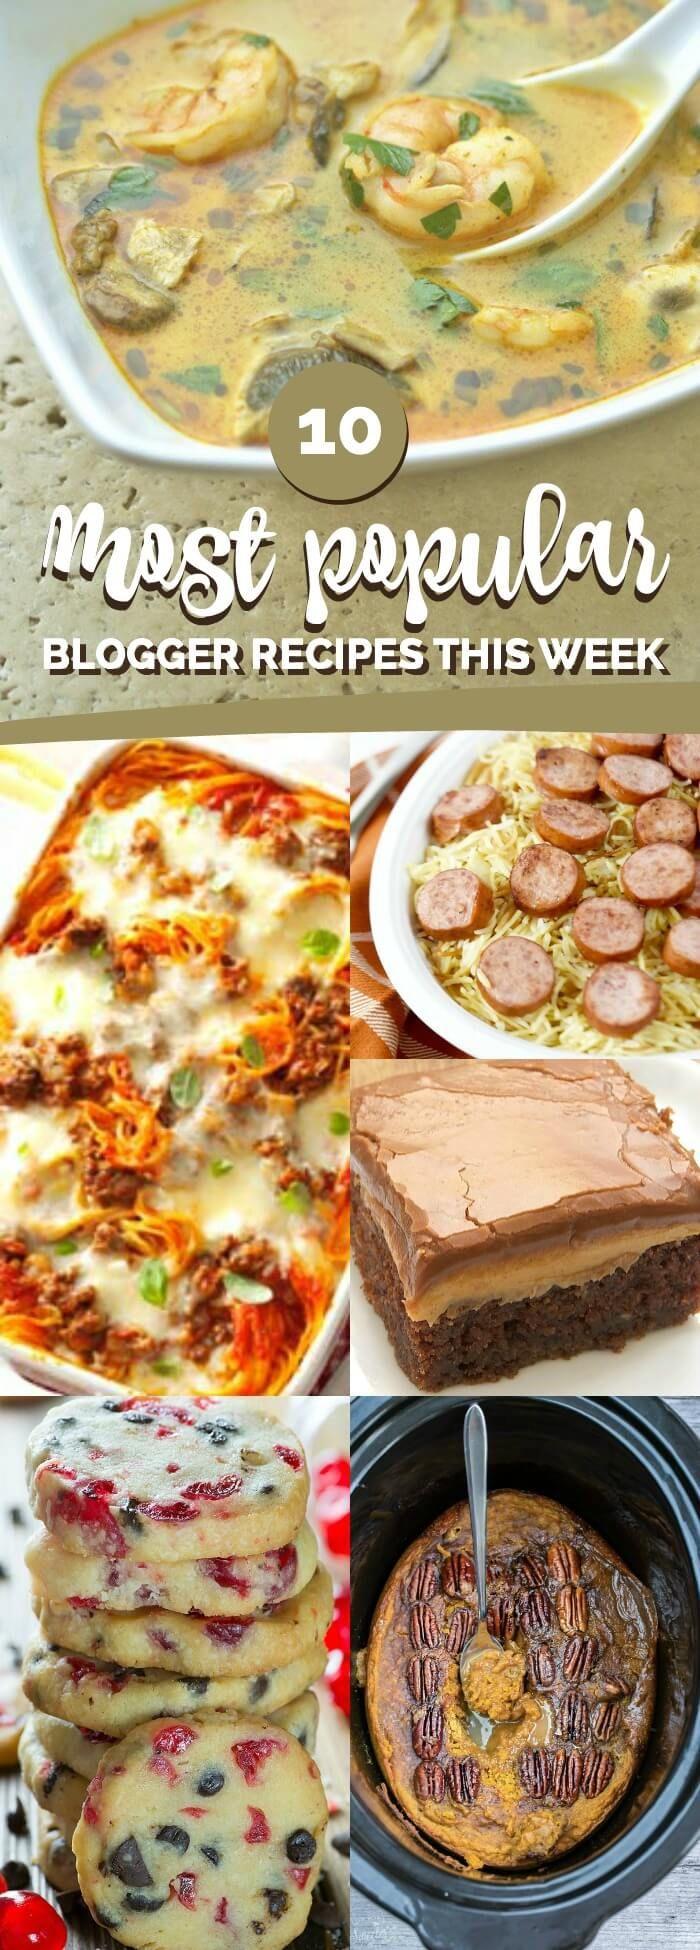 10 Most Popular Recipes this Week: October 21 via @spaceshipslb